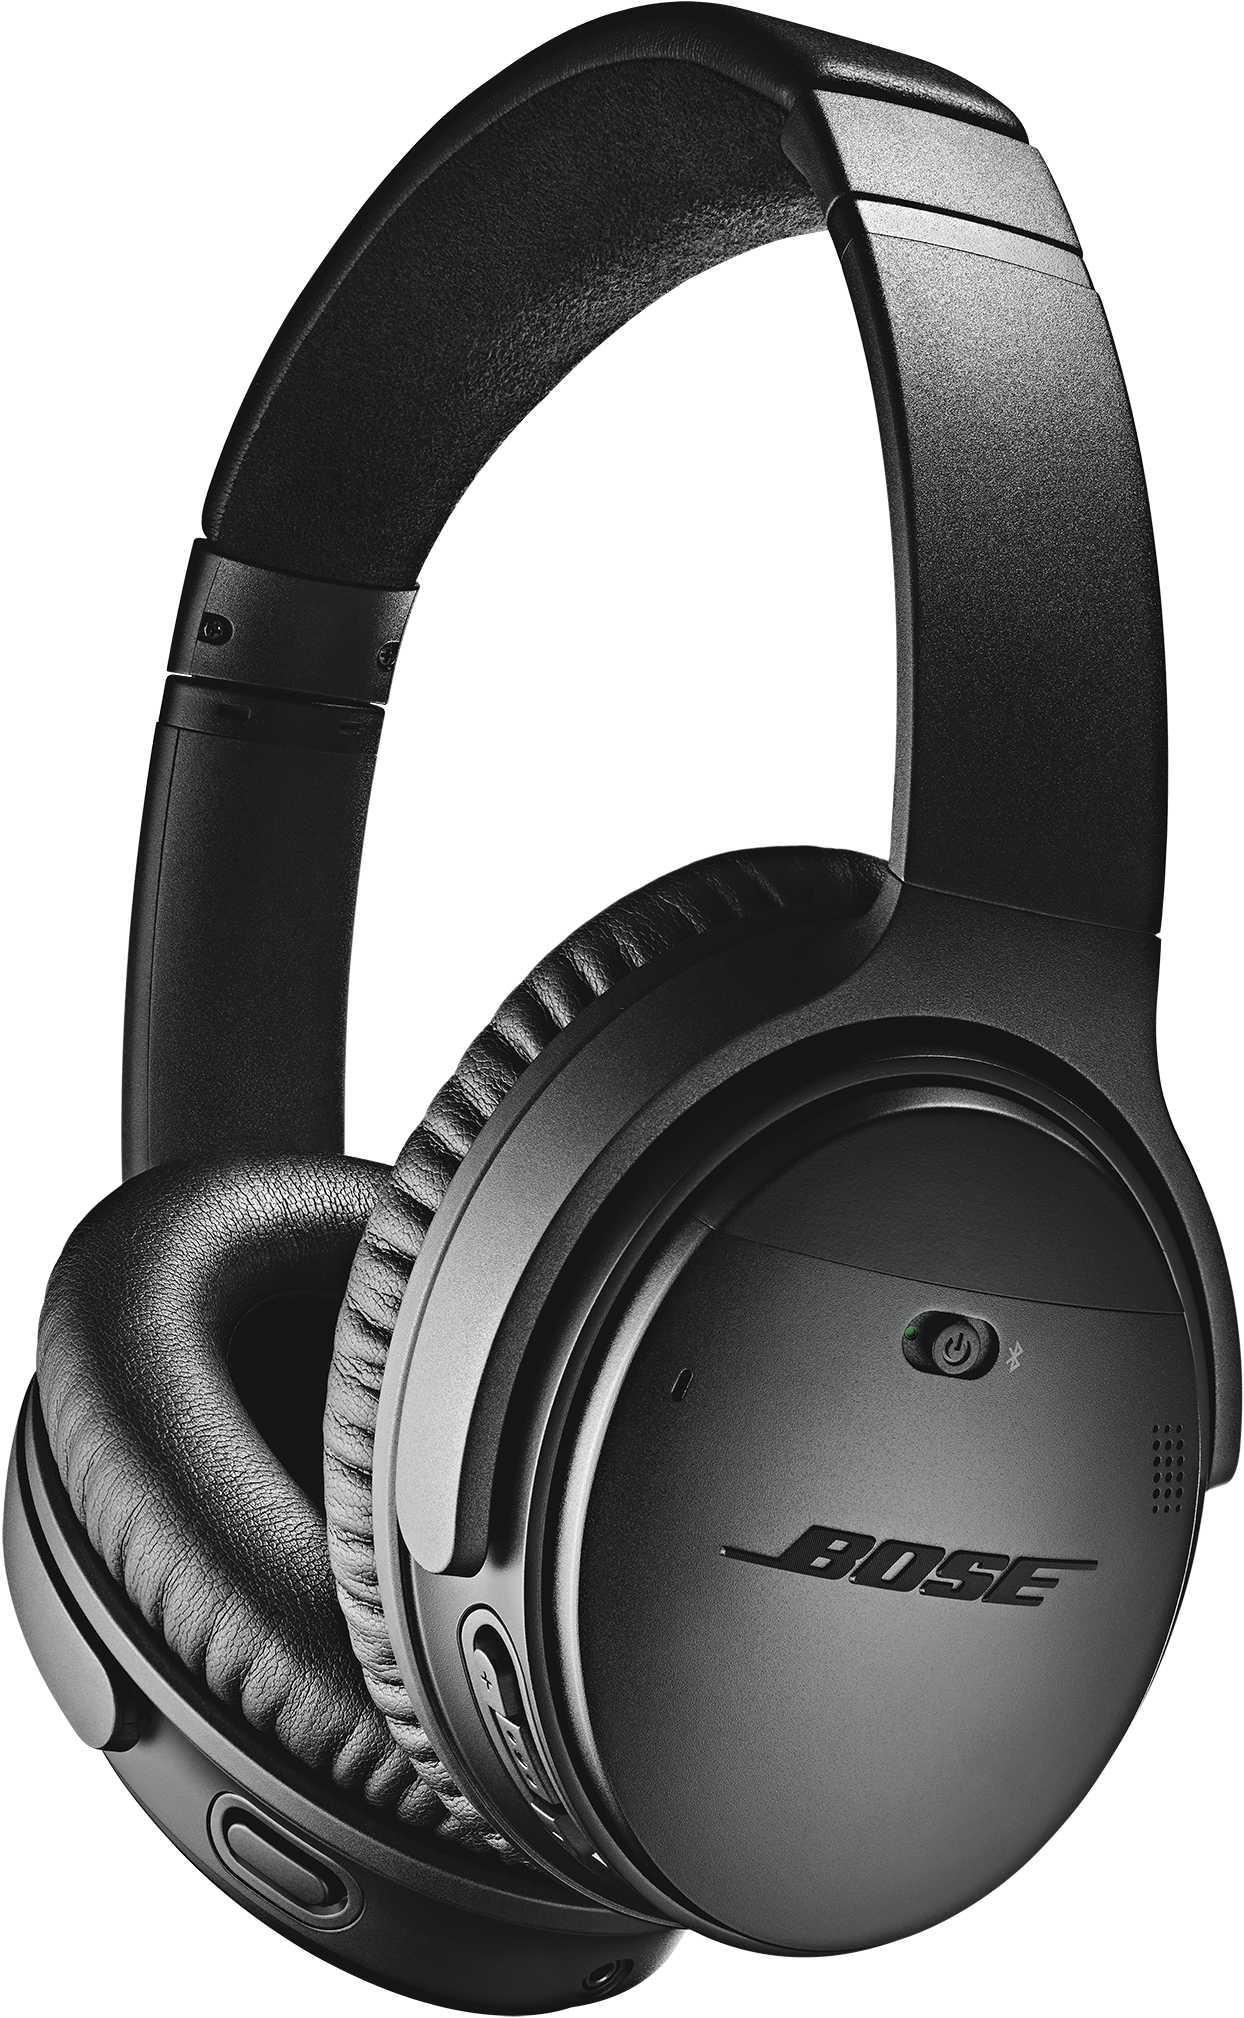 Casque audio sans-fil Bose QuietComfort 35 Series II - noir (frontaliers Suisse)